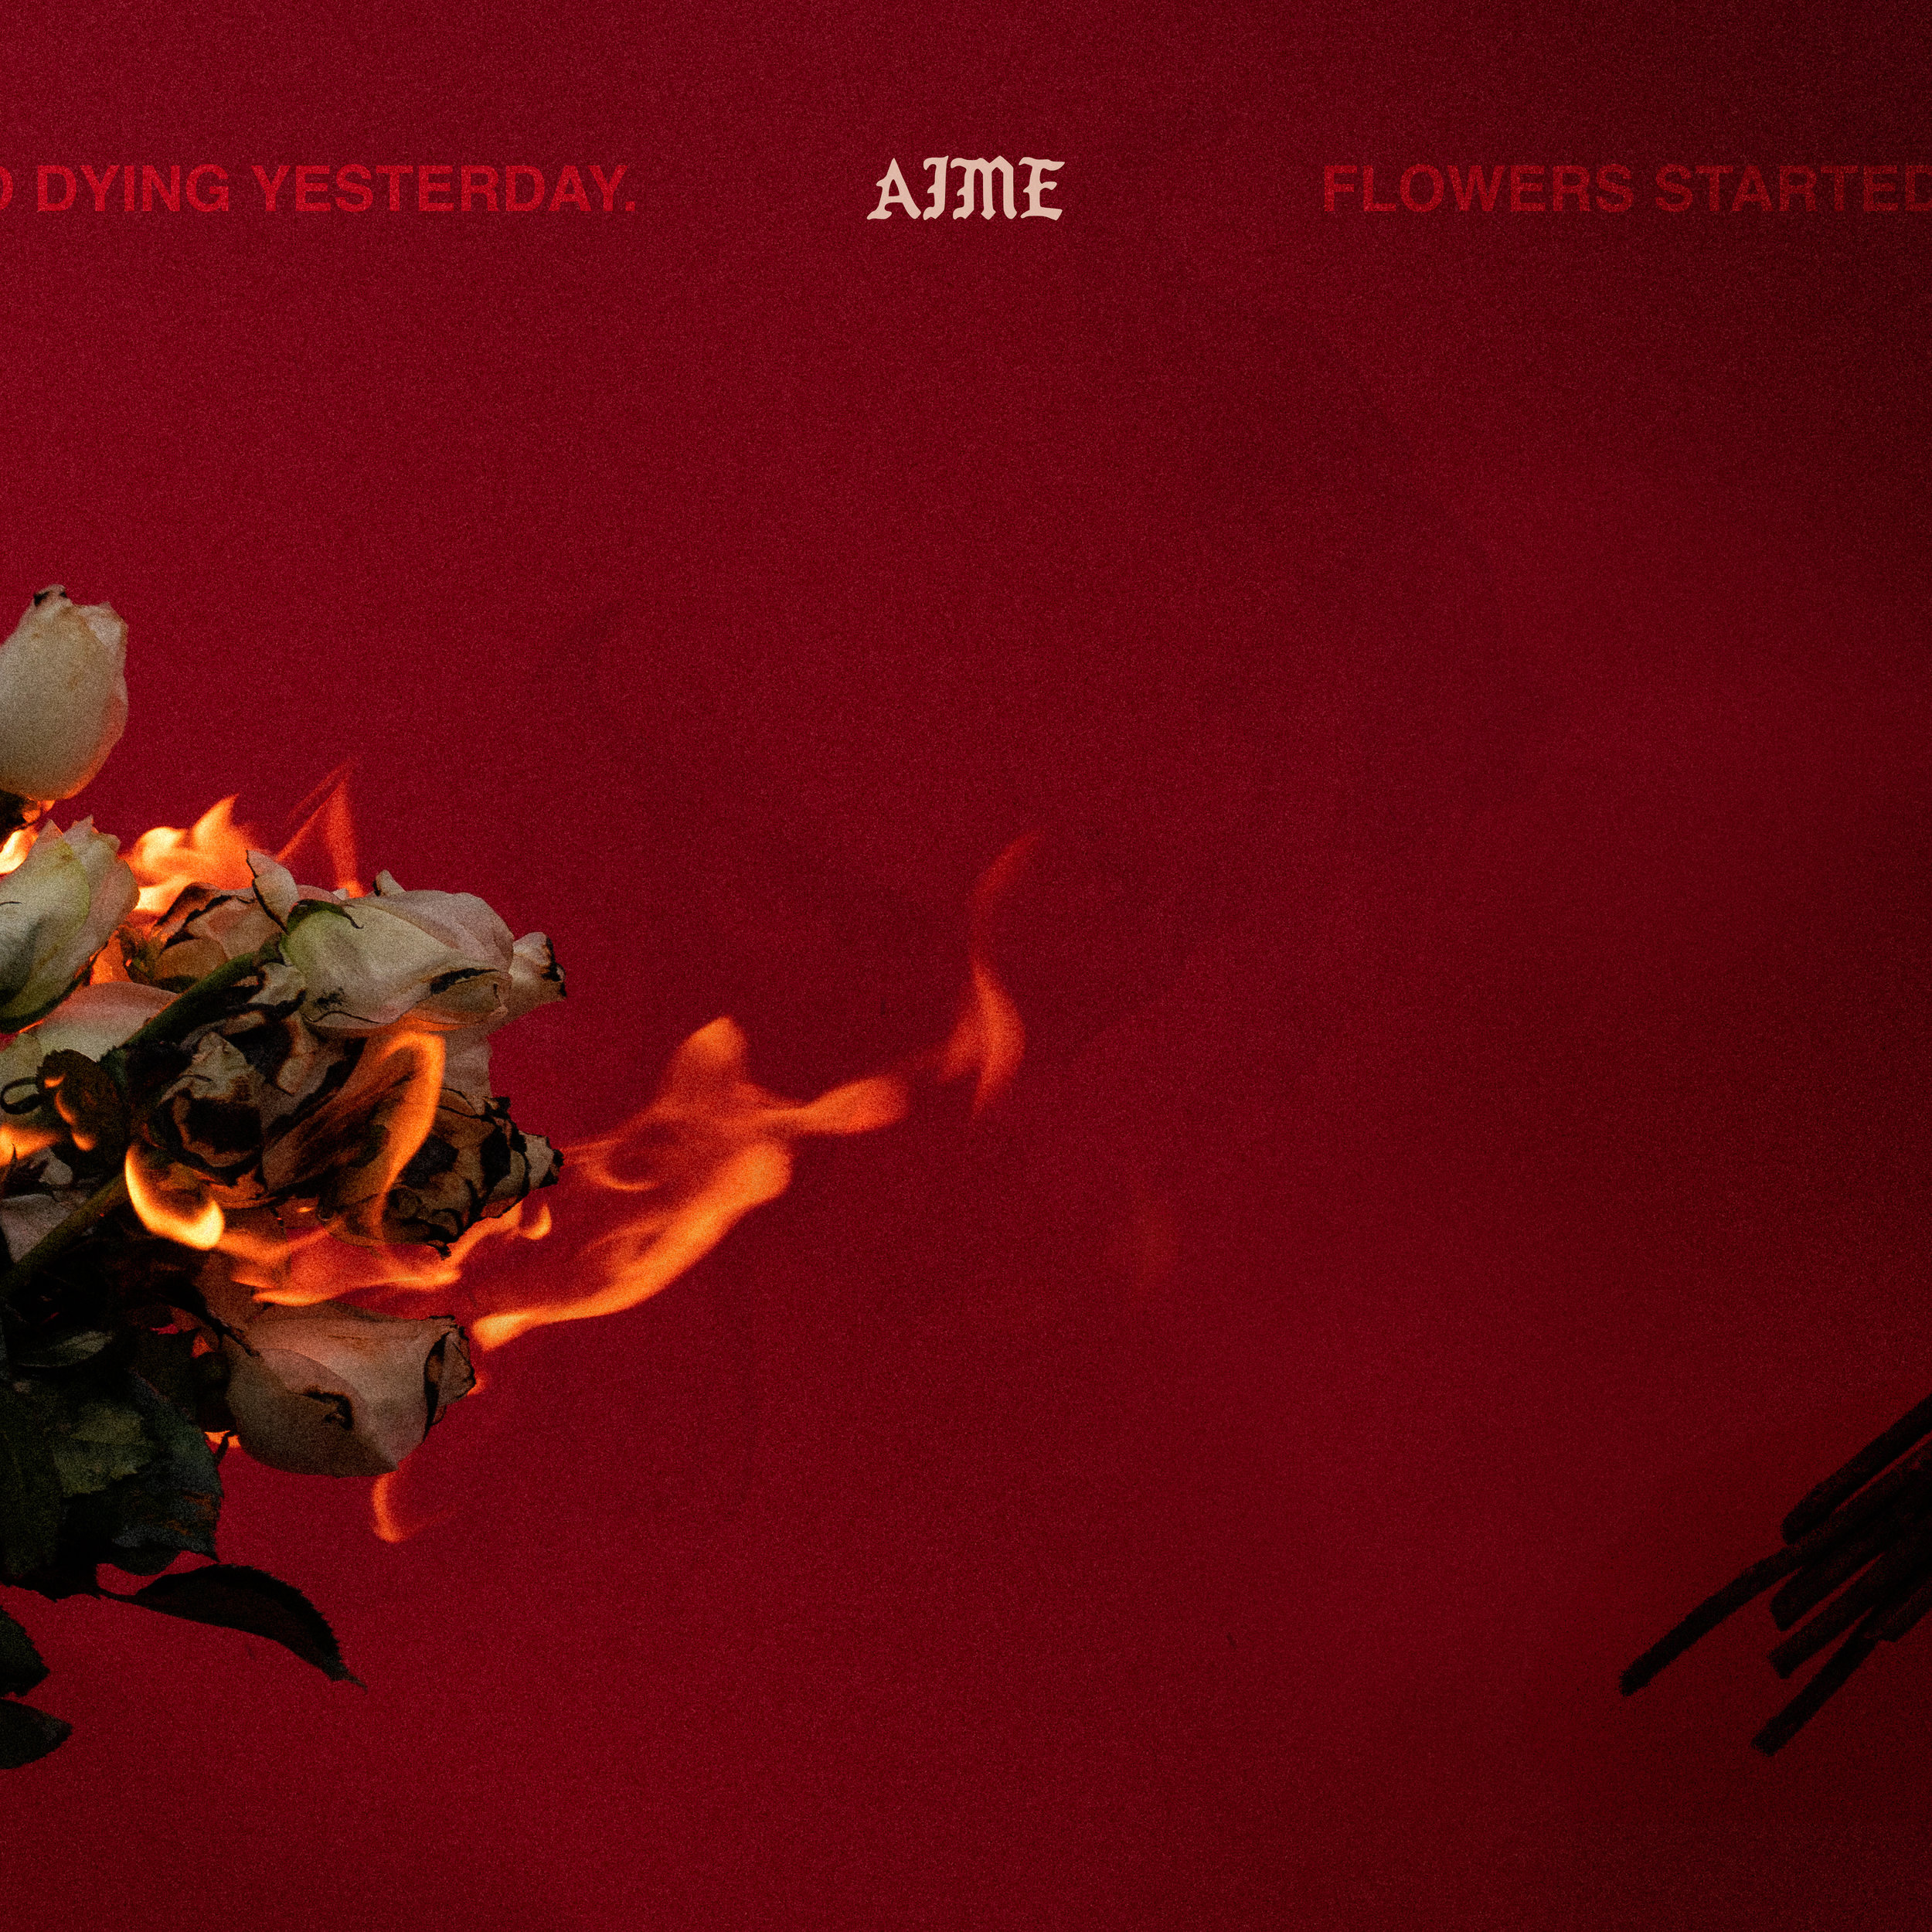 AIME FLOWERS FINAL (1).jpg